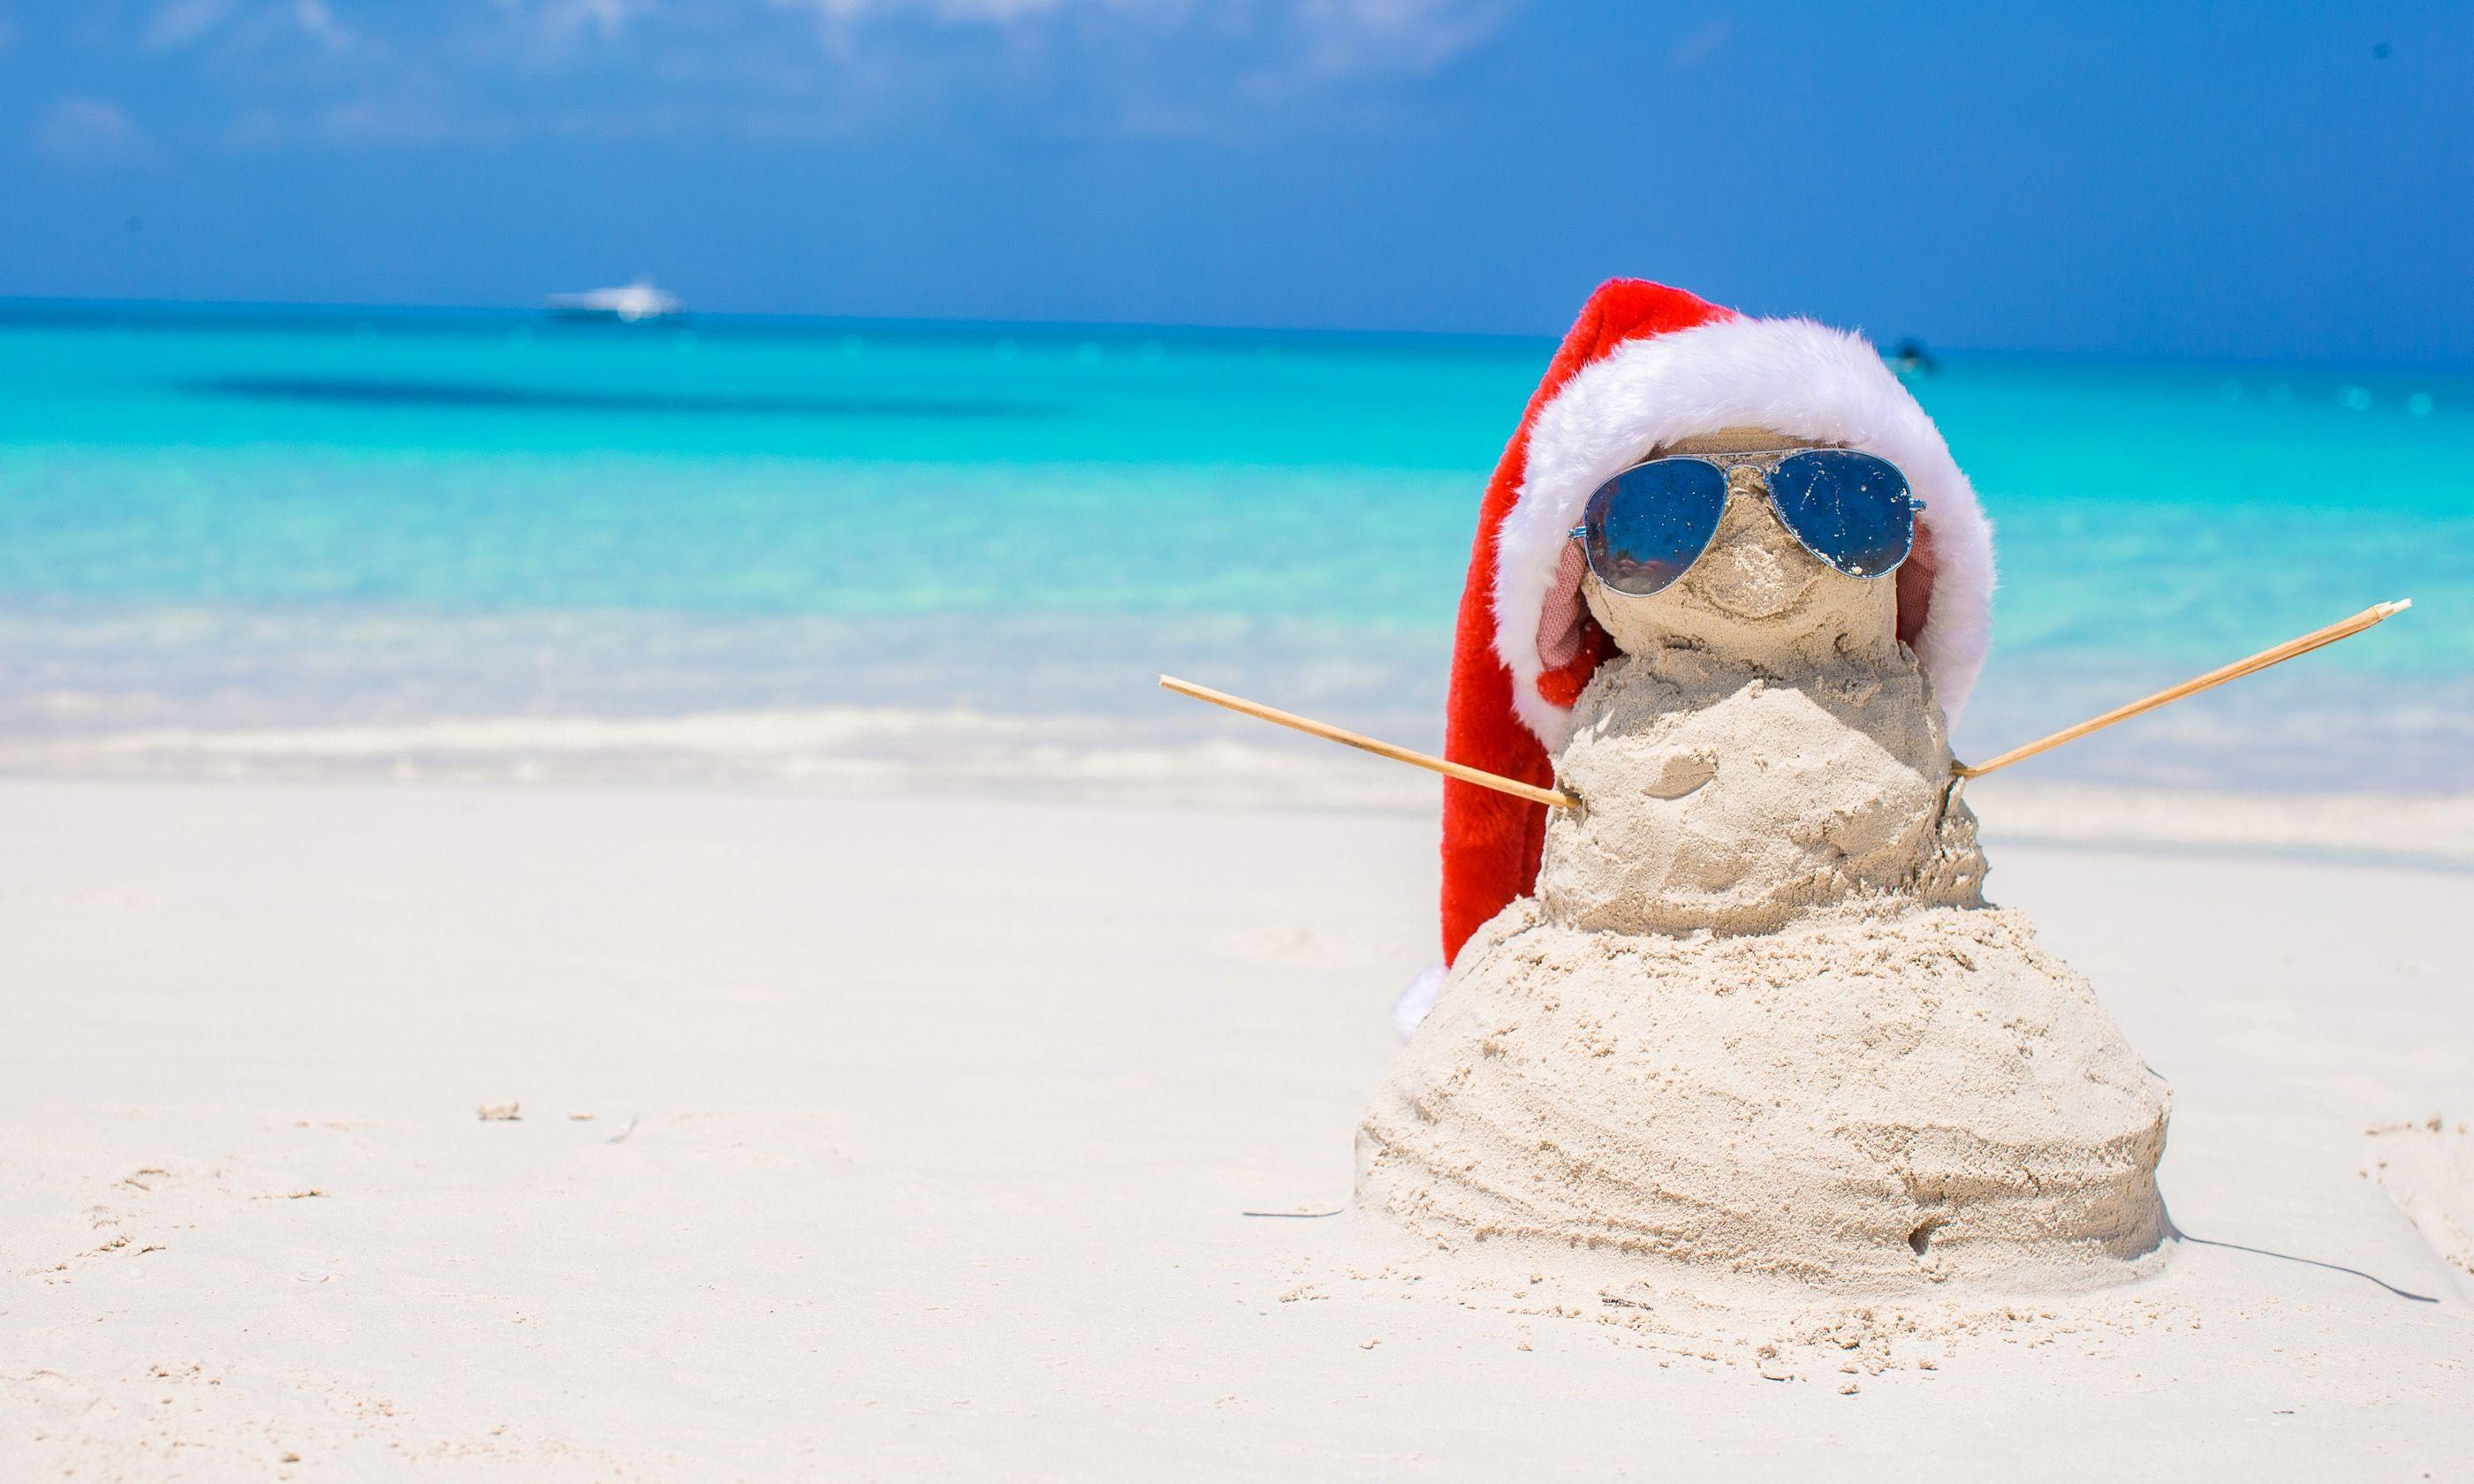 Christmas sandman on the beach (Dreamstime)